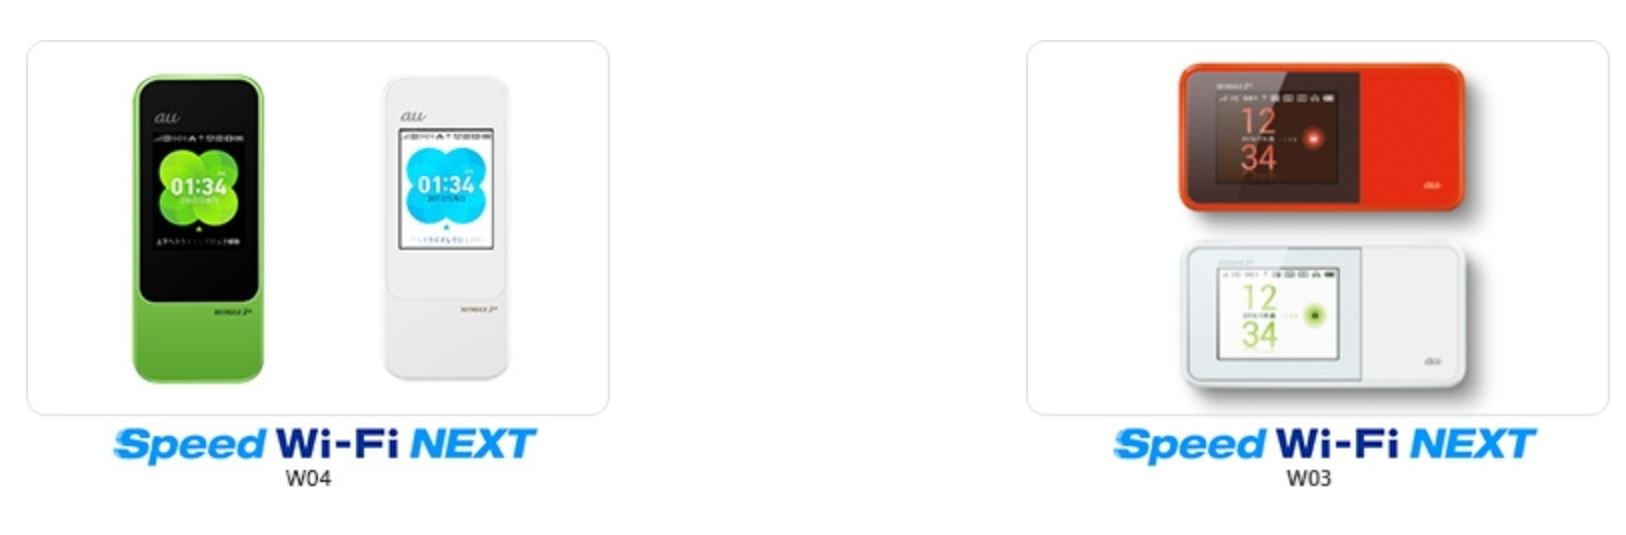 auスマートバリューmine適用対象端末のspeed Wi-Fi NEXT W03とW04の端末画像